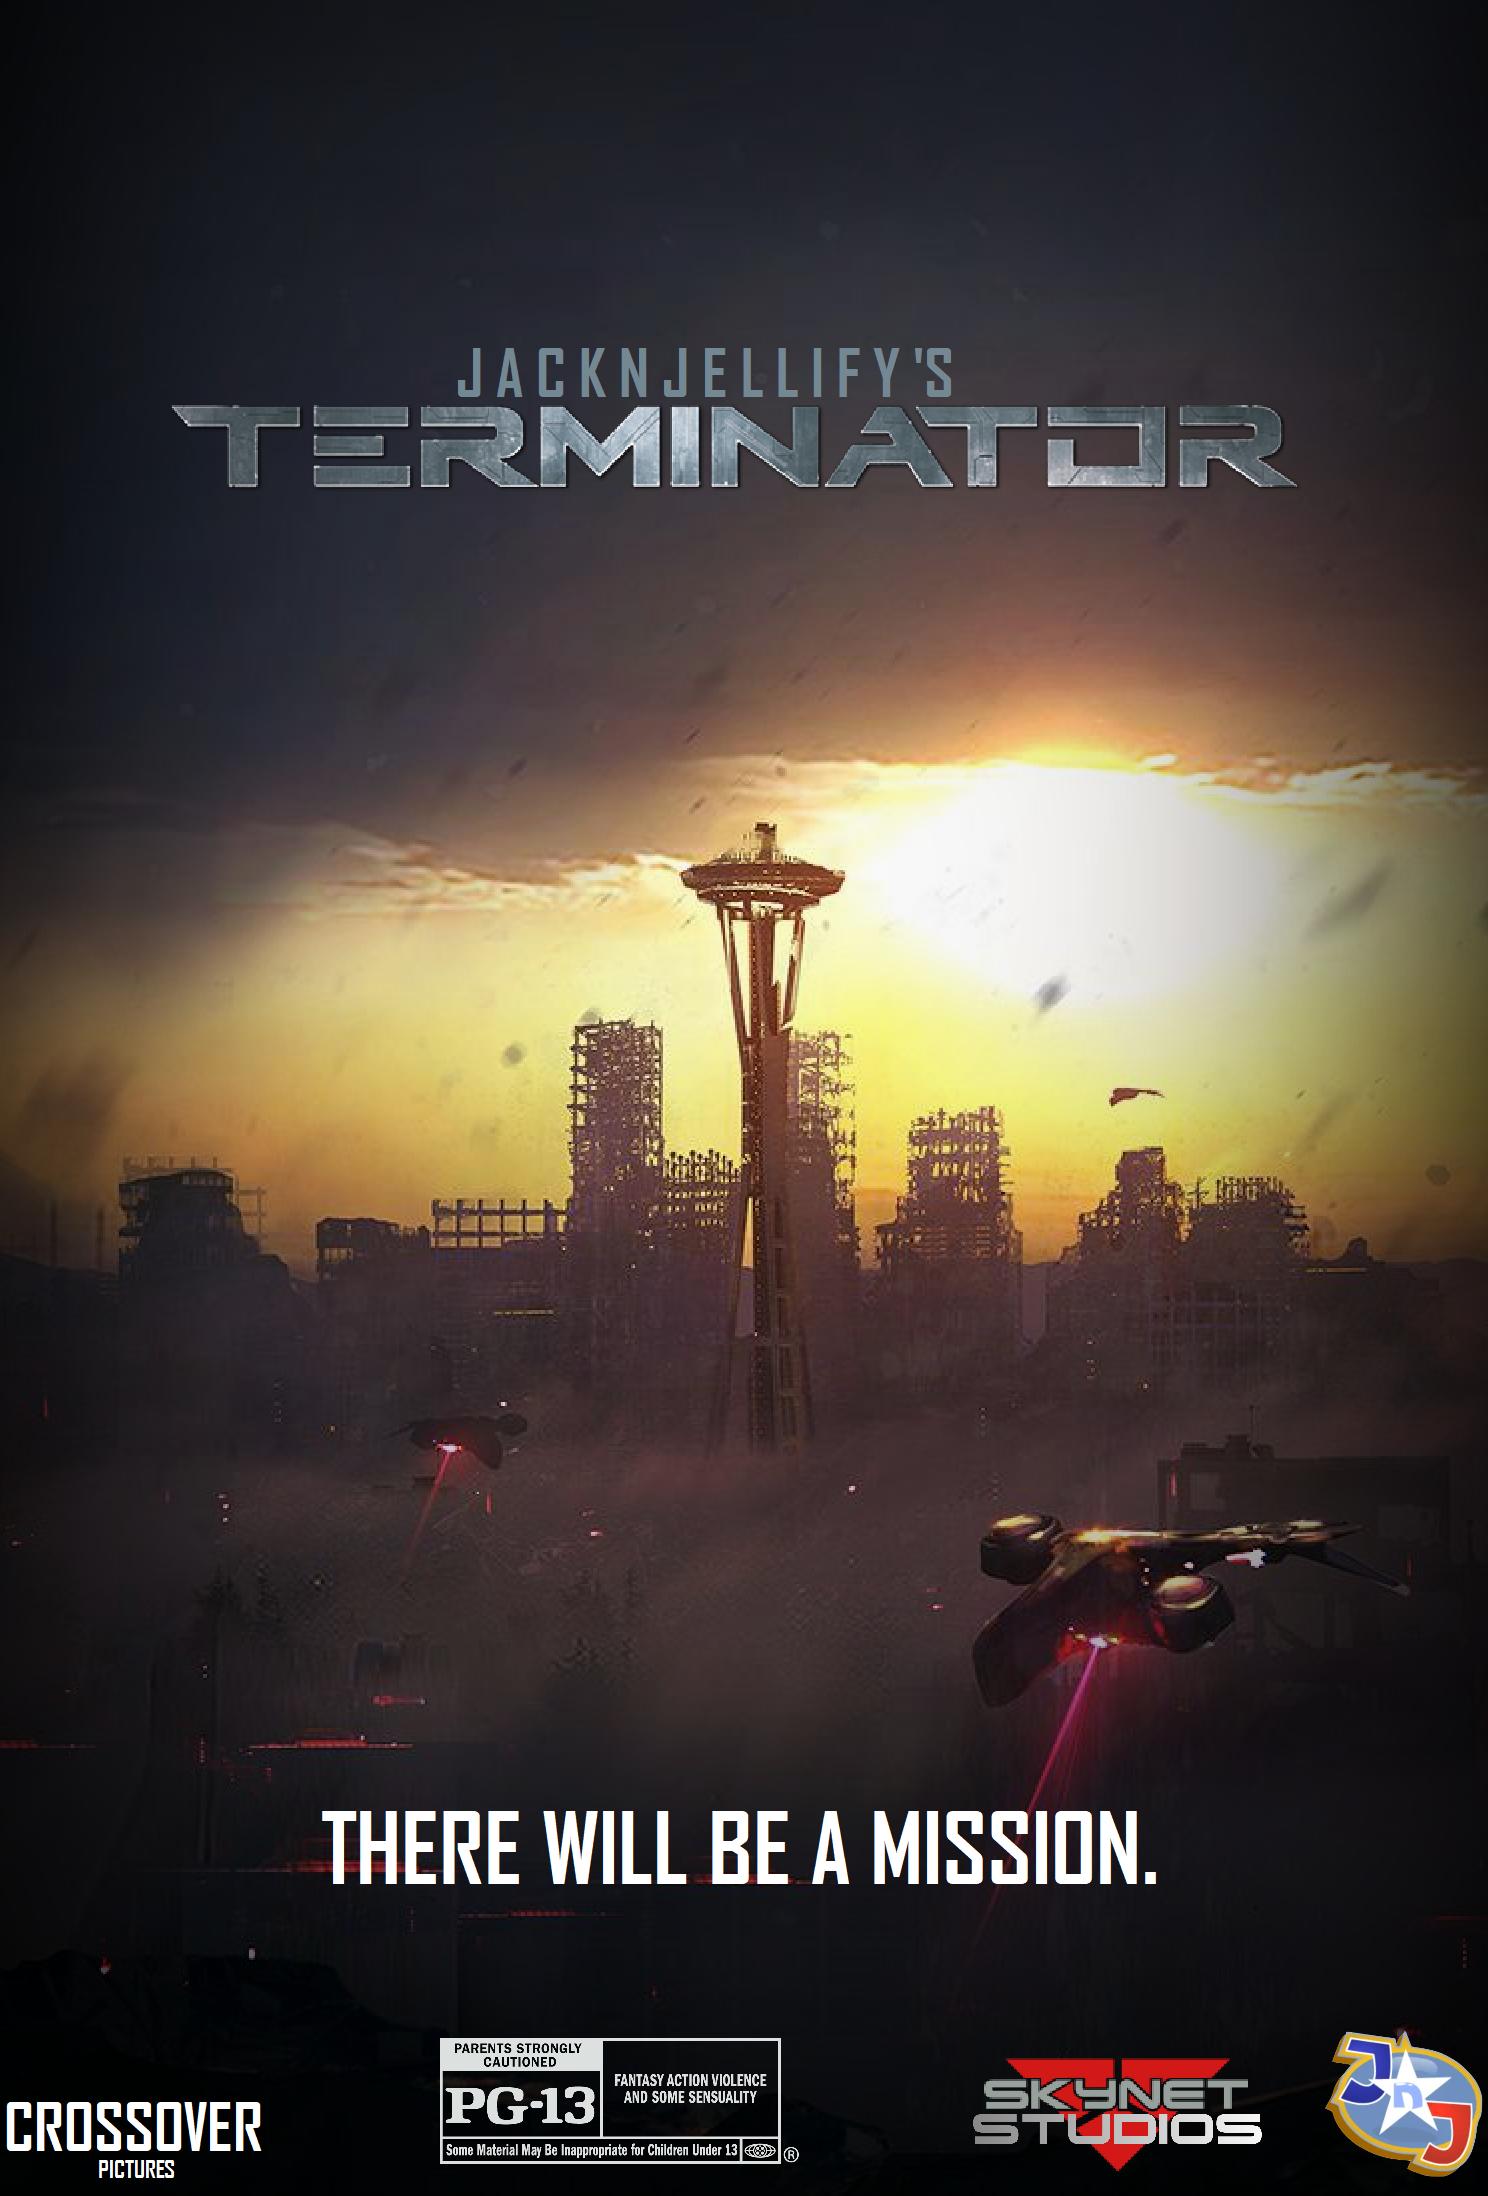 Jacknjellify's Terminator